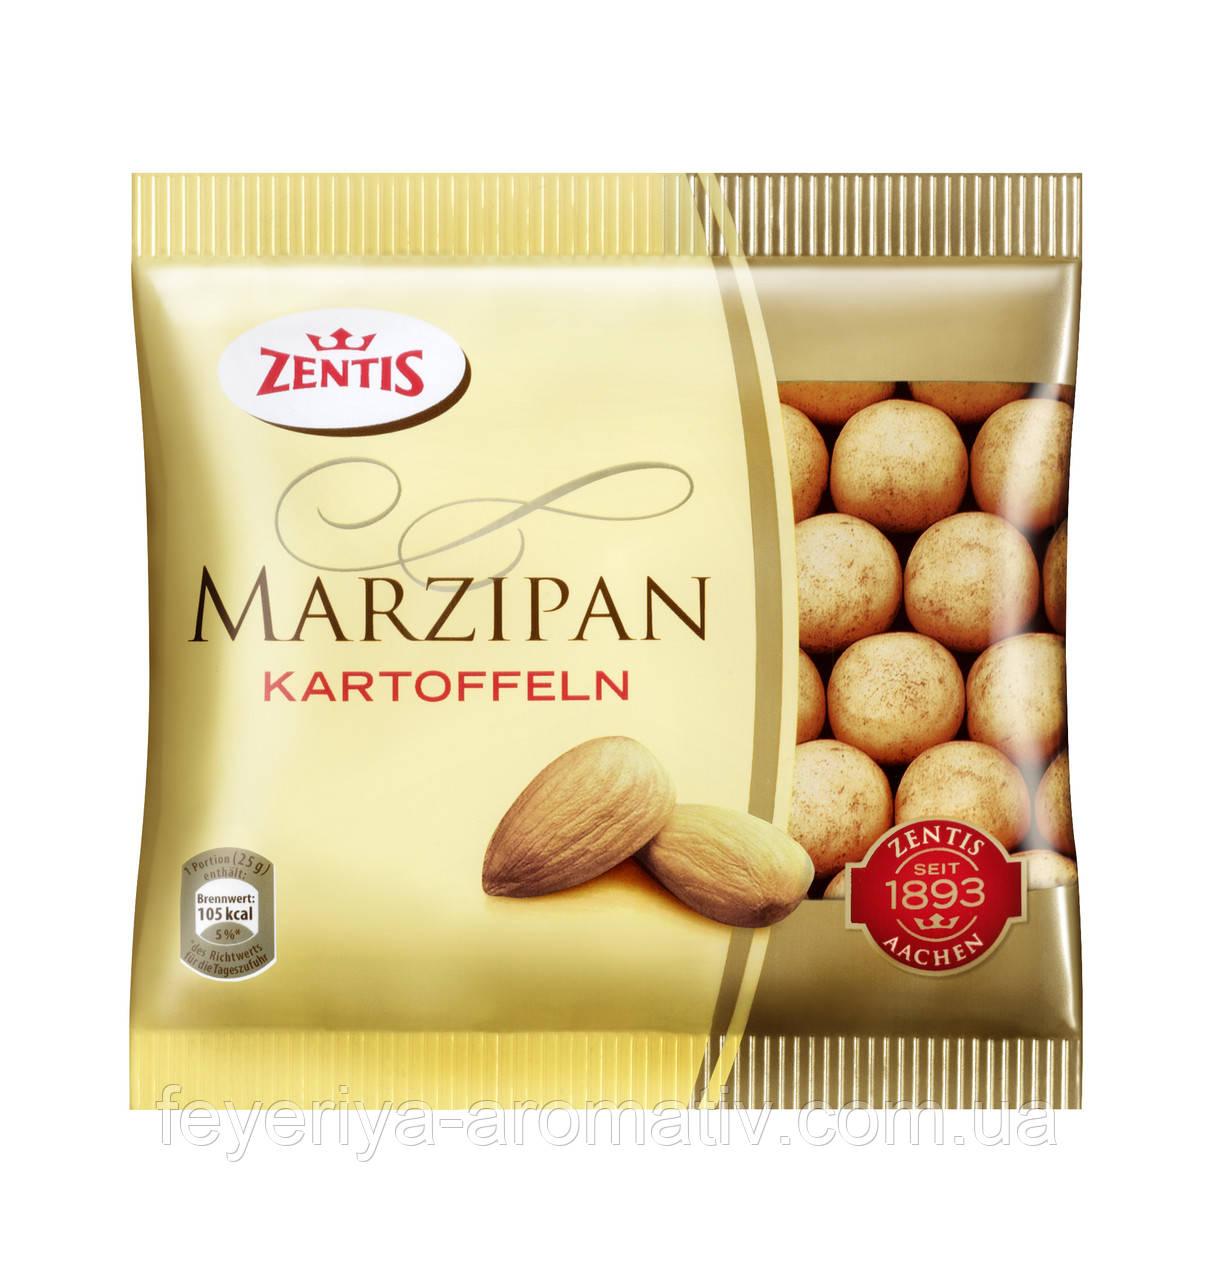 Марципановые конфеты Zentis Marzipan Kartoffeln 100г (Германия)